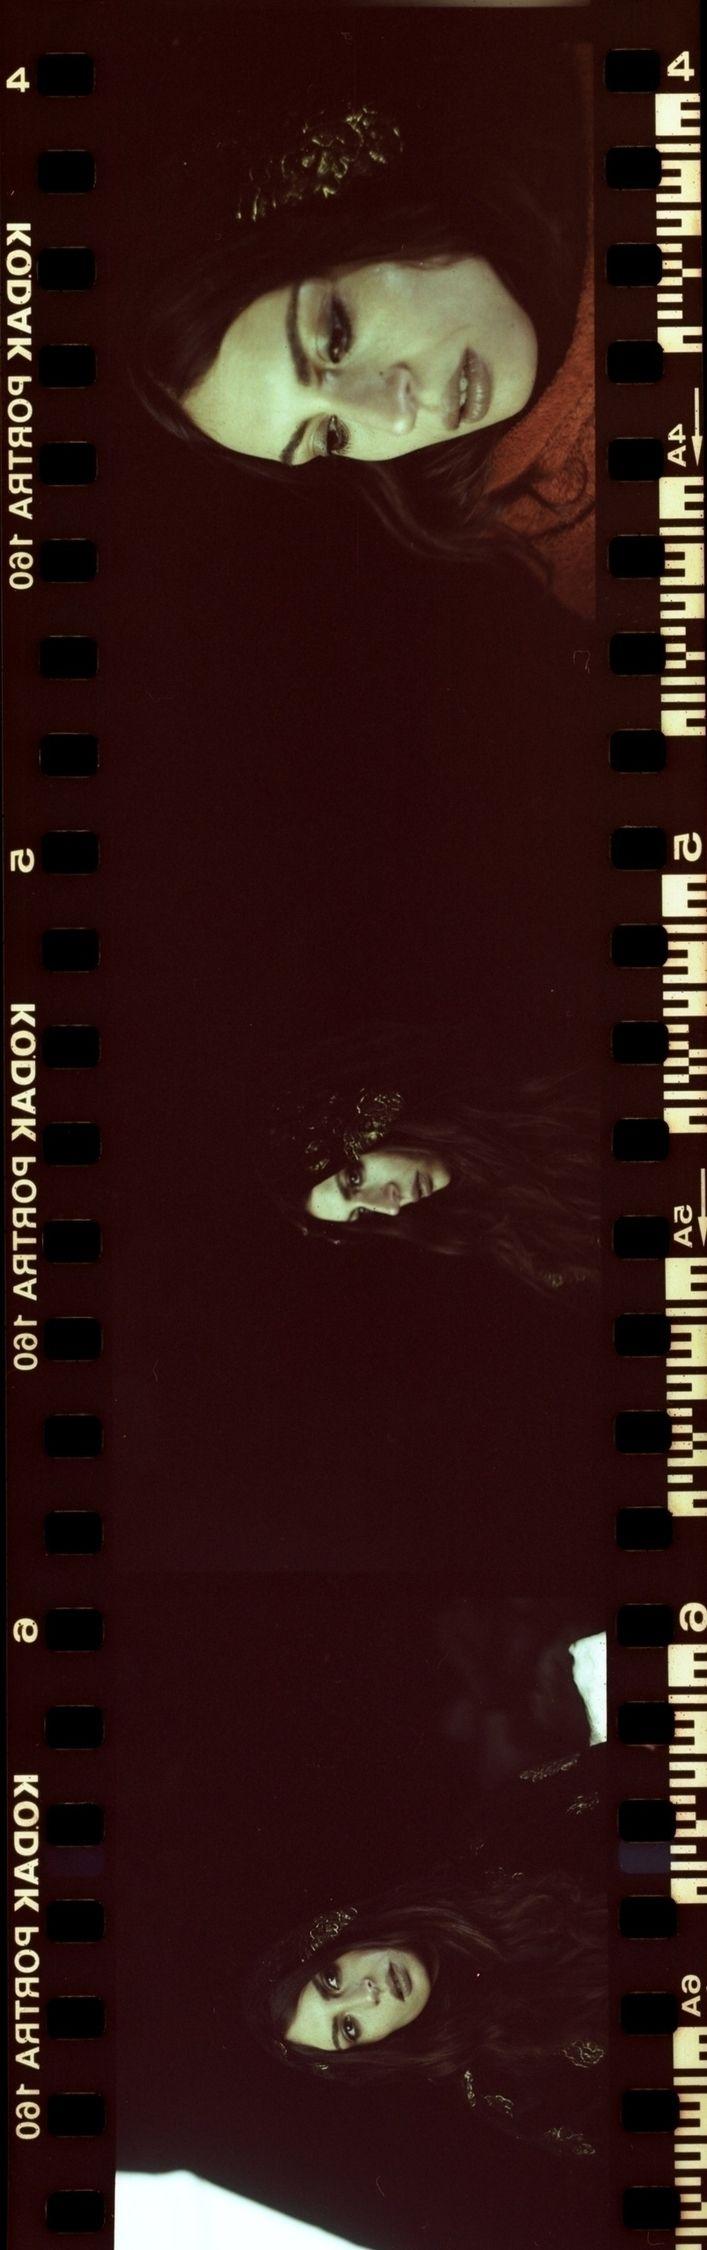 portrait night set - photography - cabra | ello